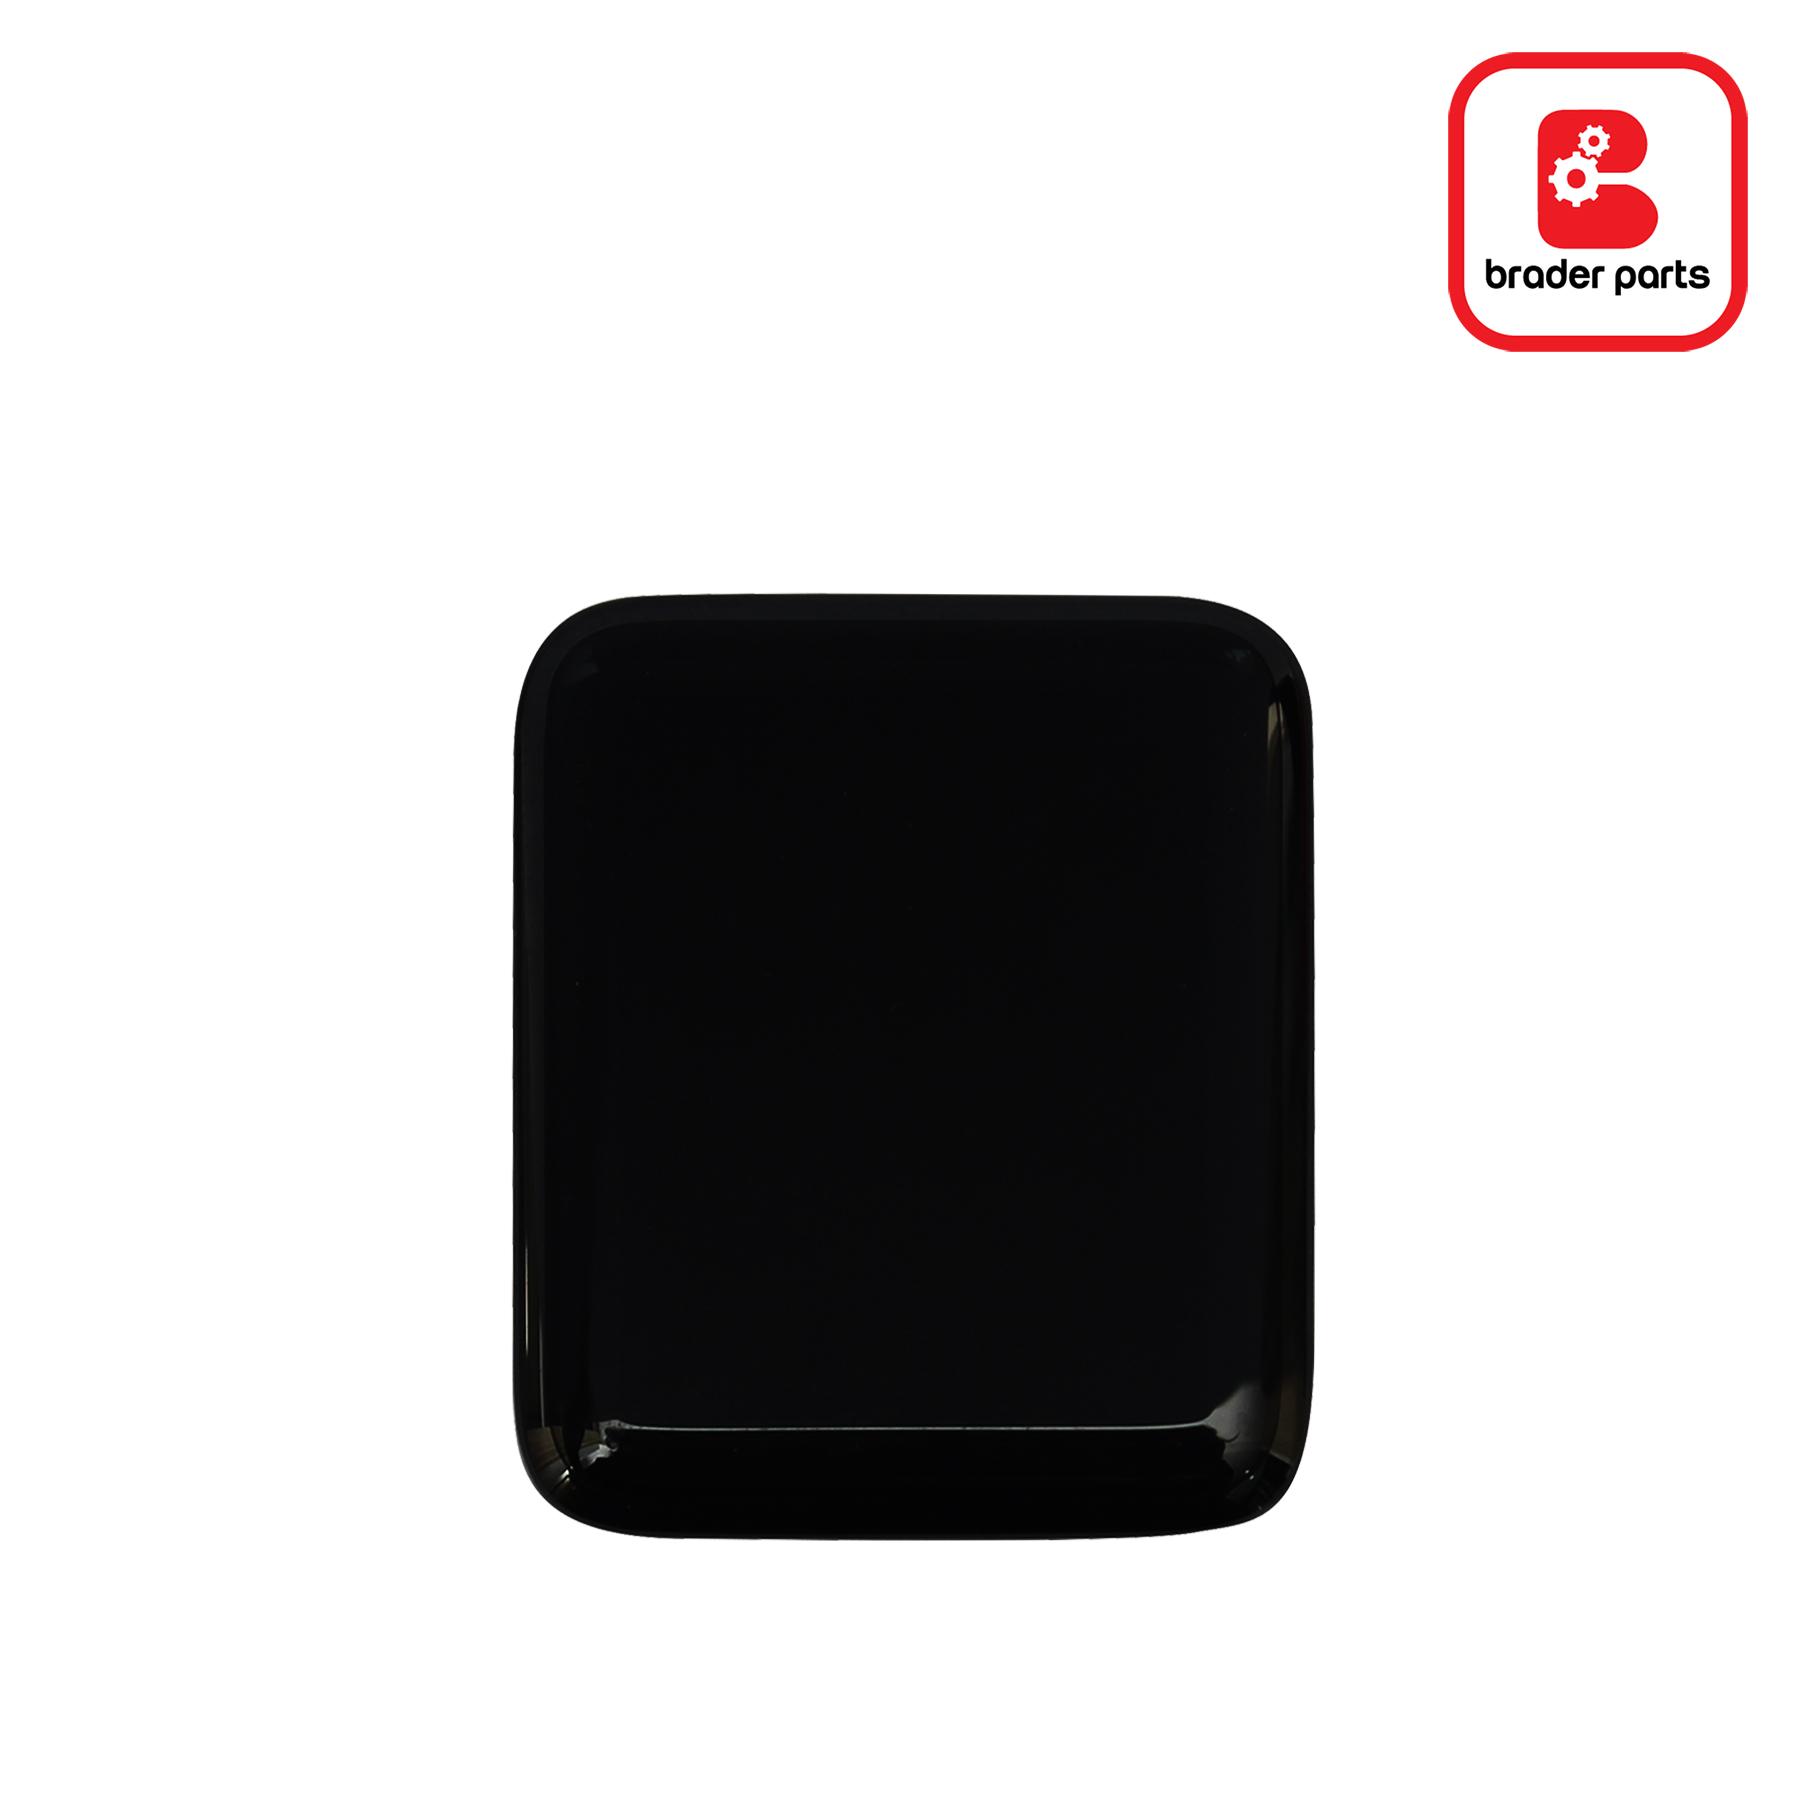 Lcd Touchscreen iWatch 3 38MM GPS